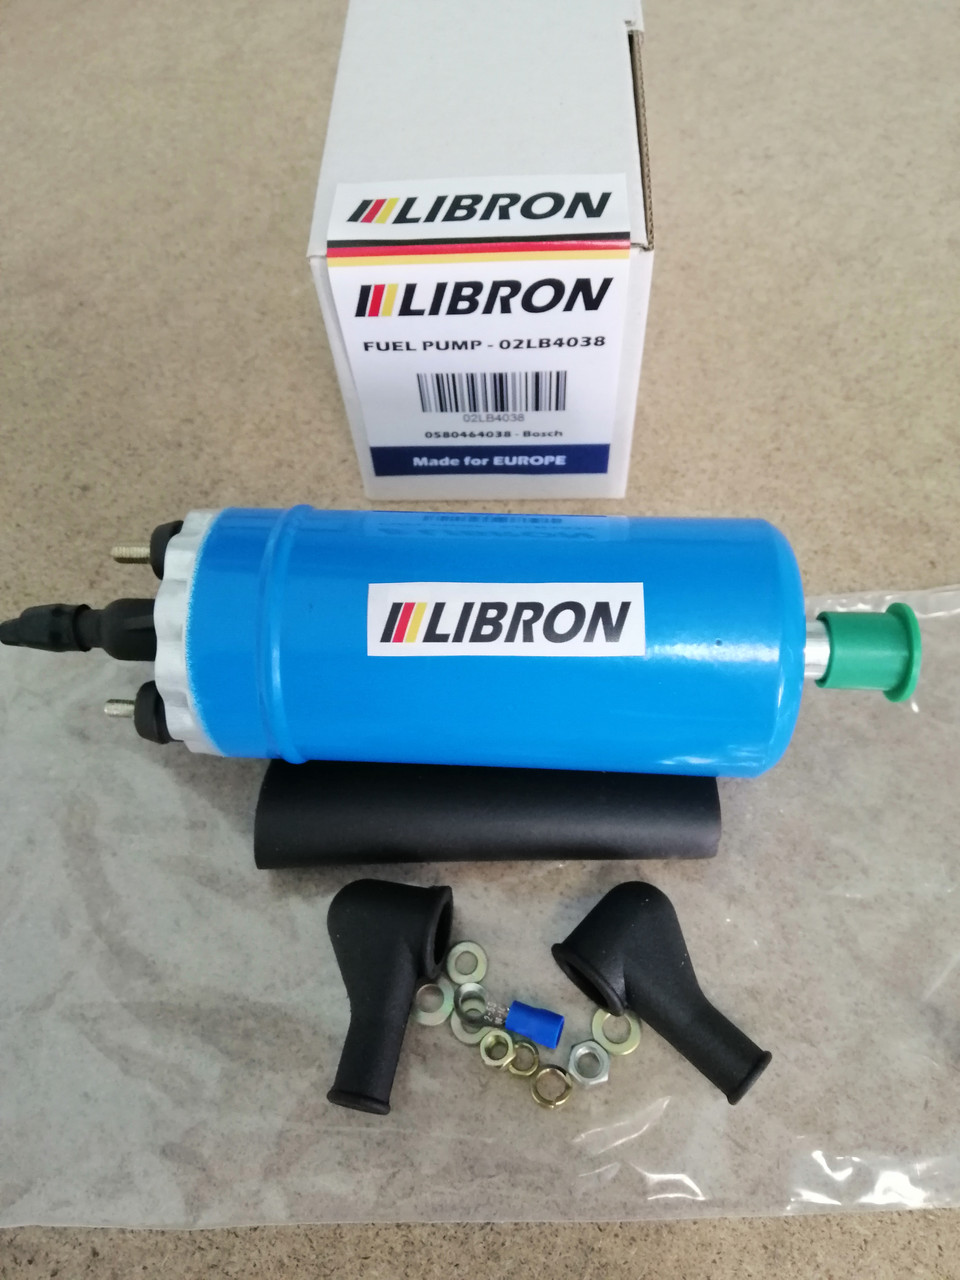 Топливный насос LIBRON 02LB4038 - BMW 7 (E23) 728 i (1978-1986)